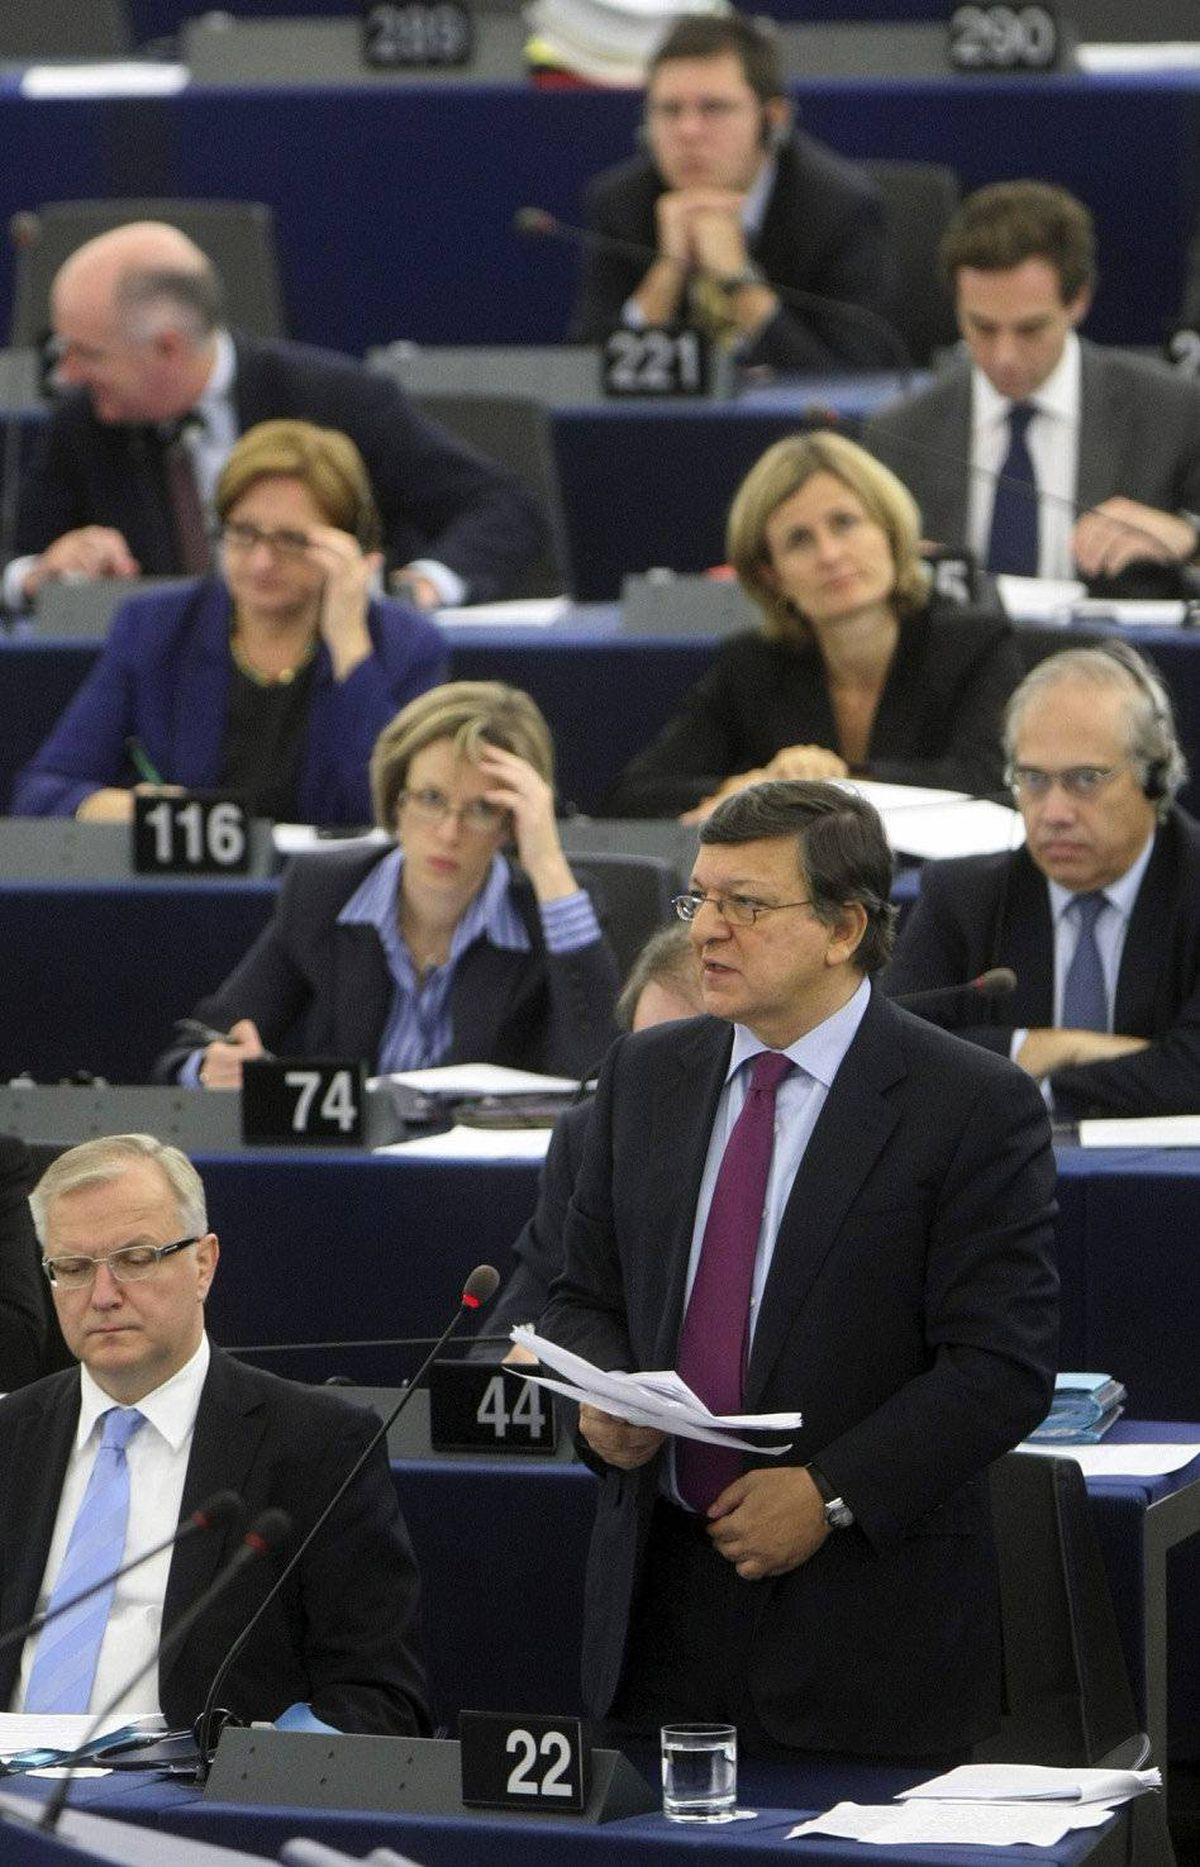 European Commission President Jose Manuel Barroso, right, addresses the European parliament in Strasbourg, eastern France, Thursday, Oct. 27, 2011.